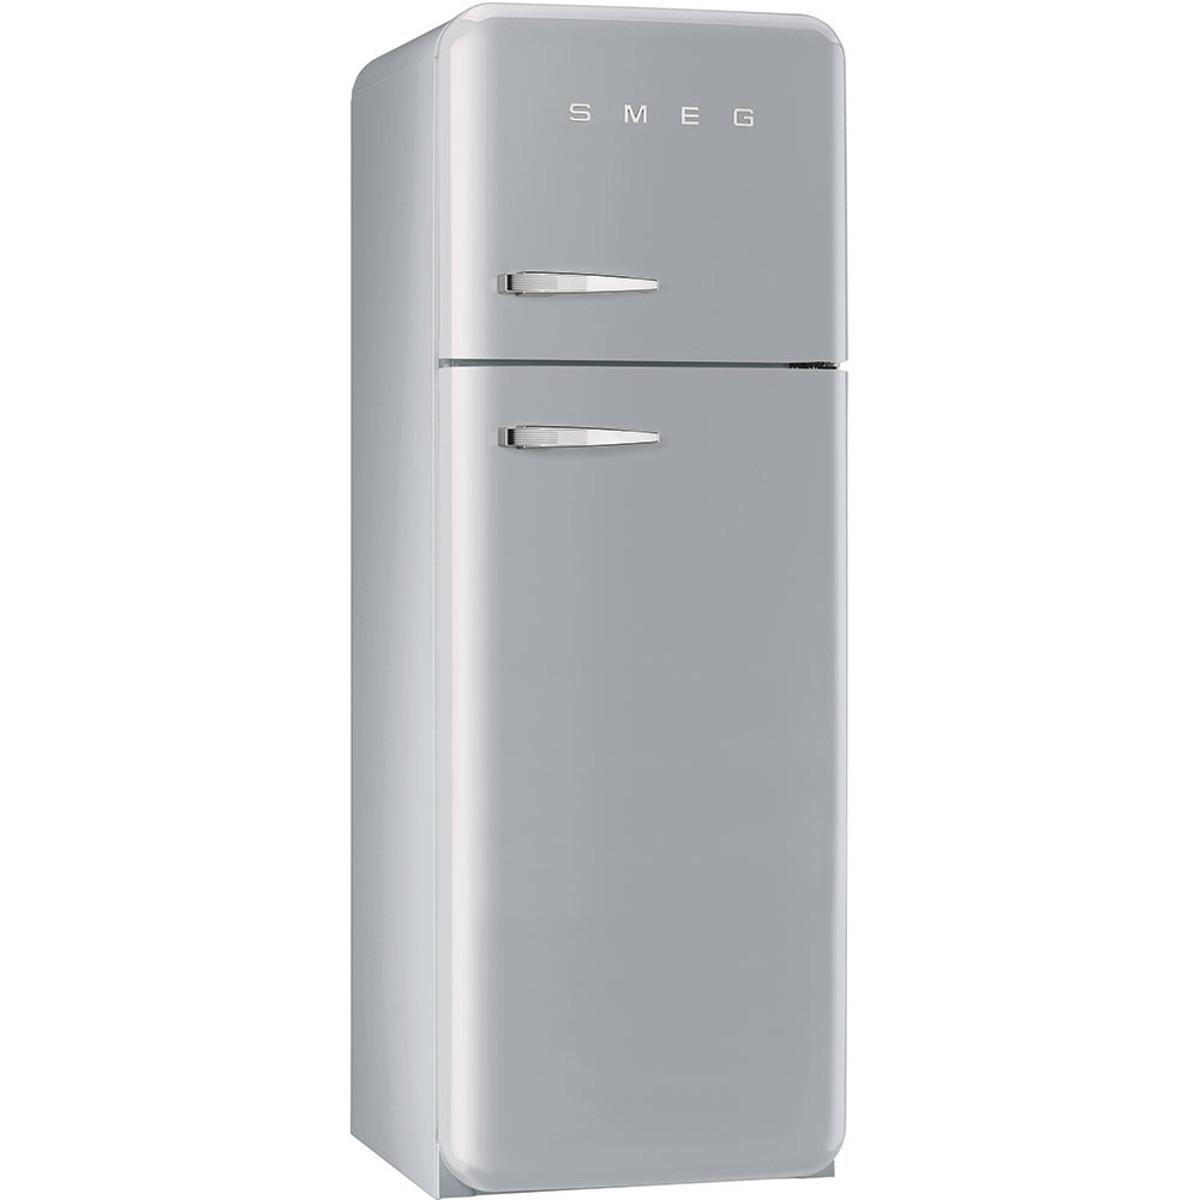 Smeg FAB30RFS 50's Style Retro Fridge Freezer – Silver